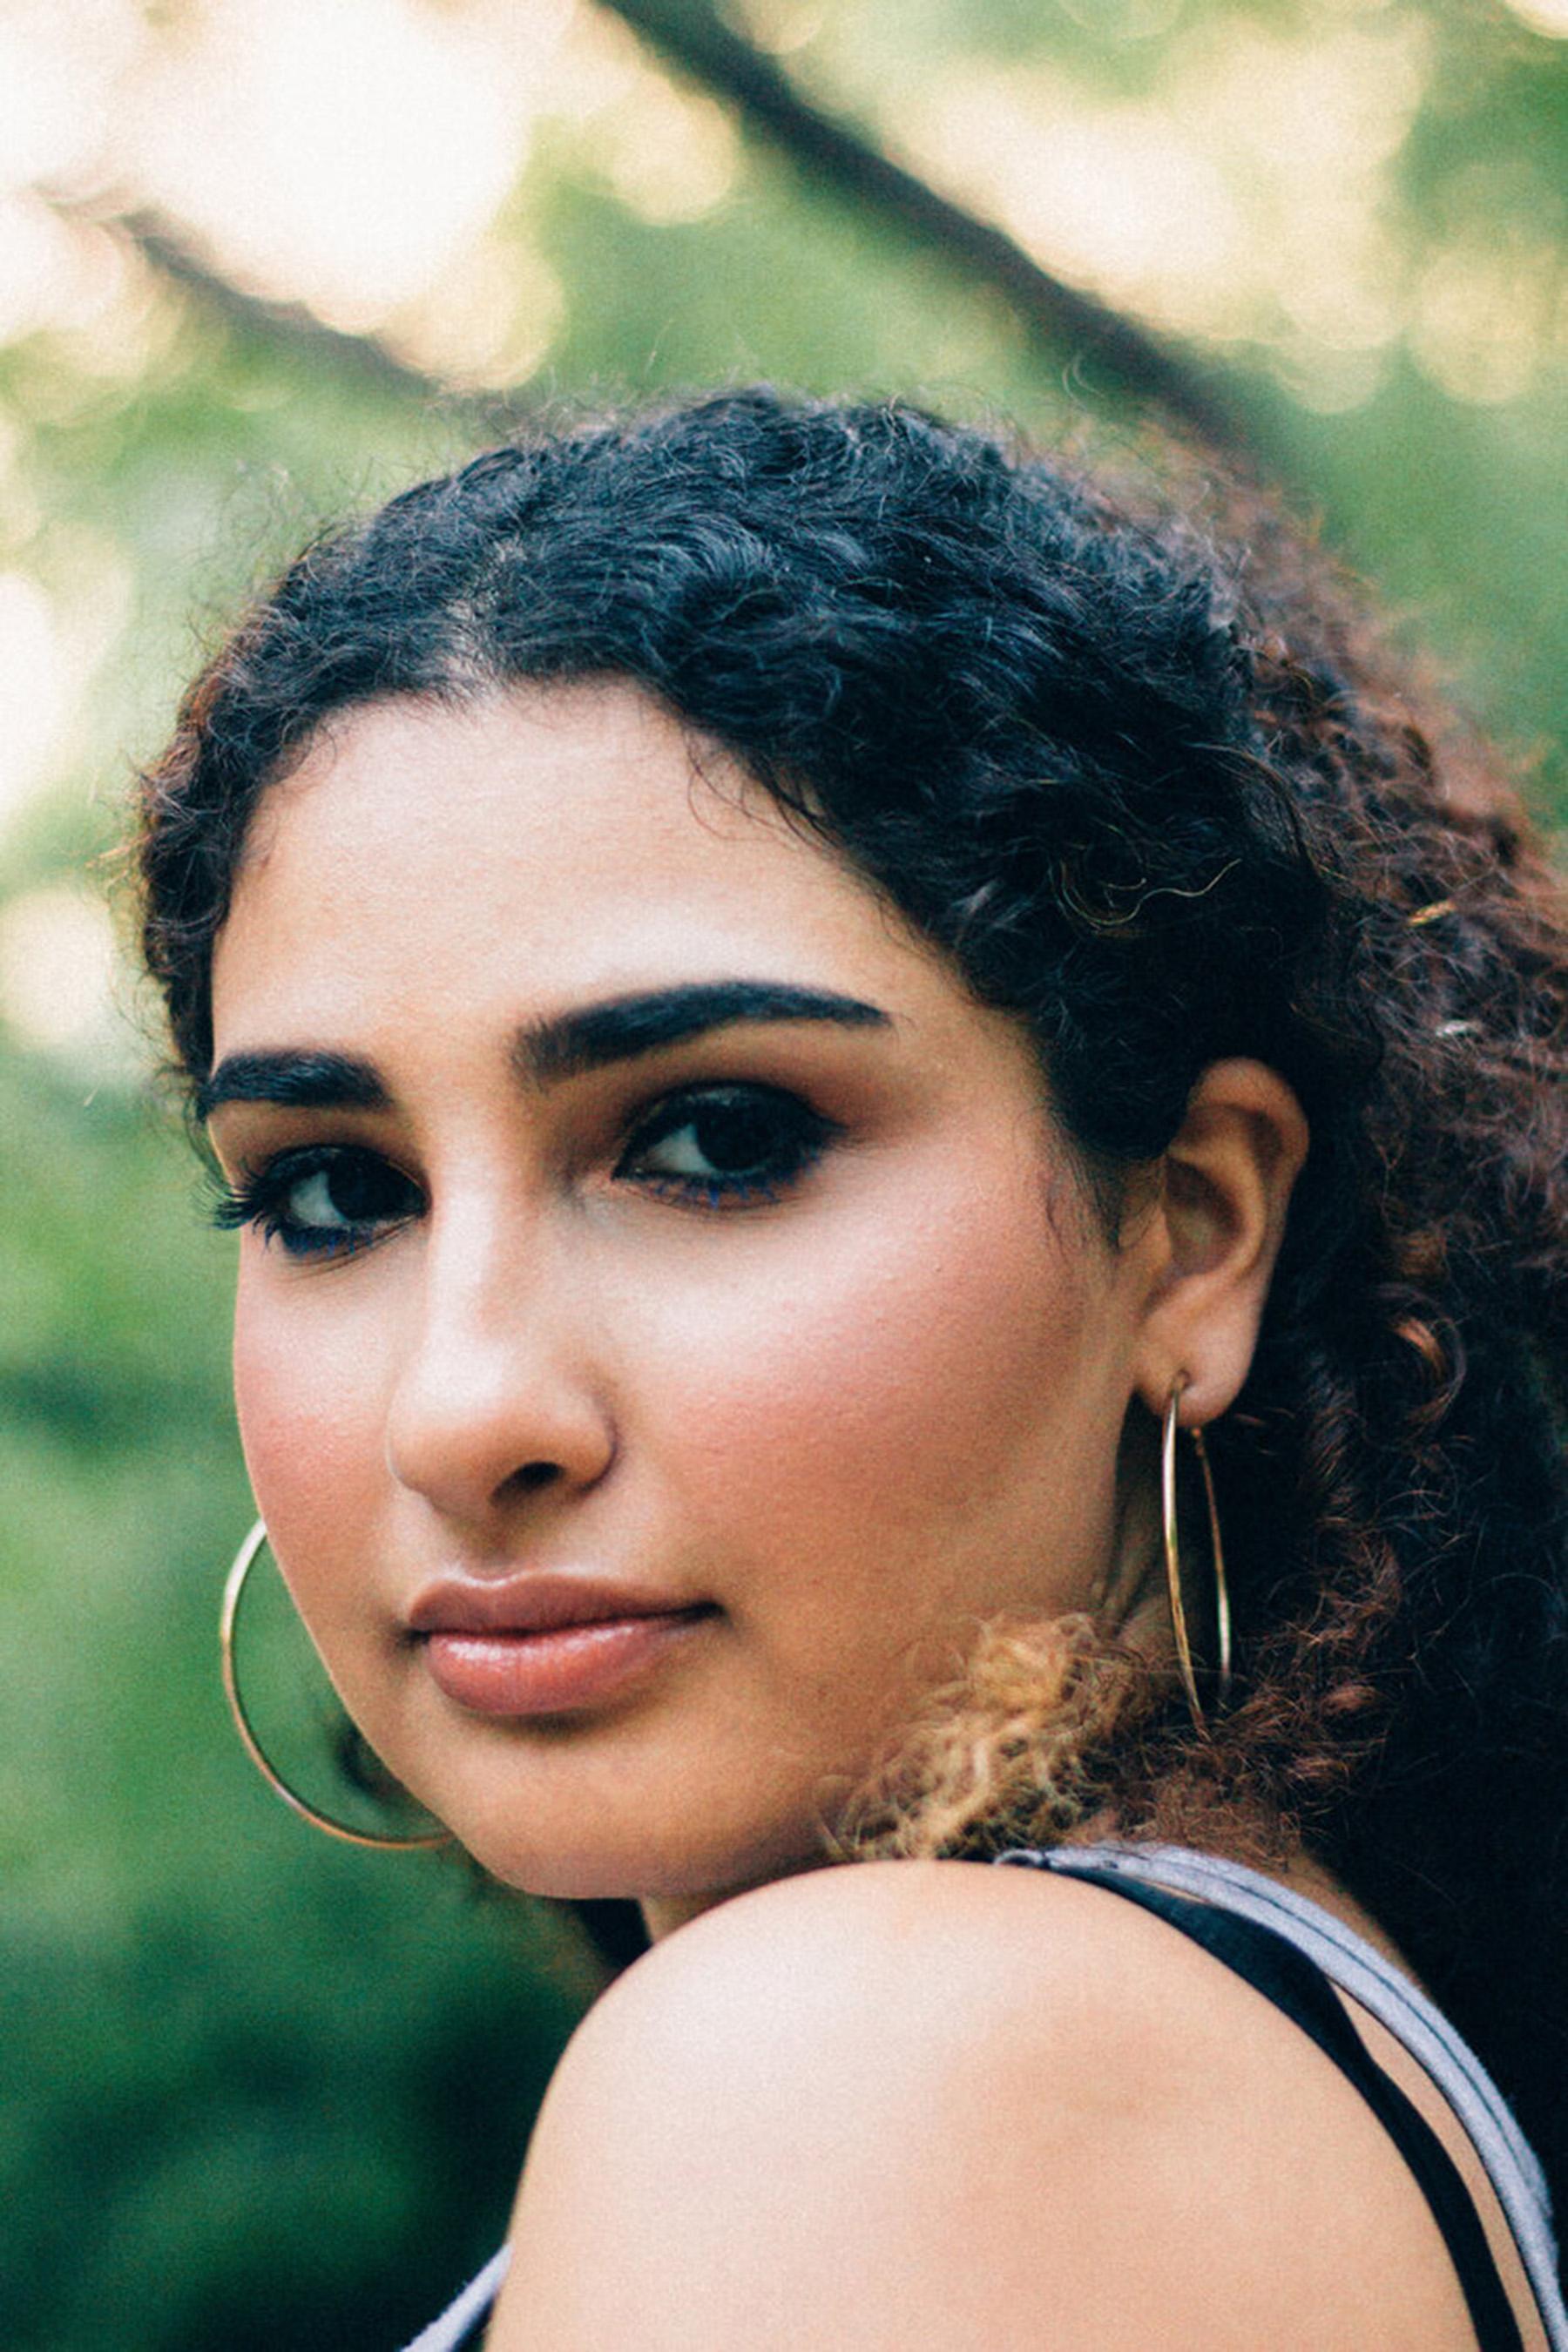 Bita Ghassemi